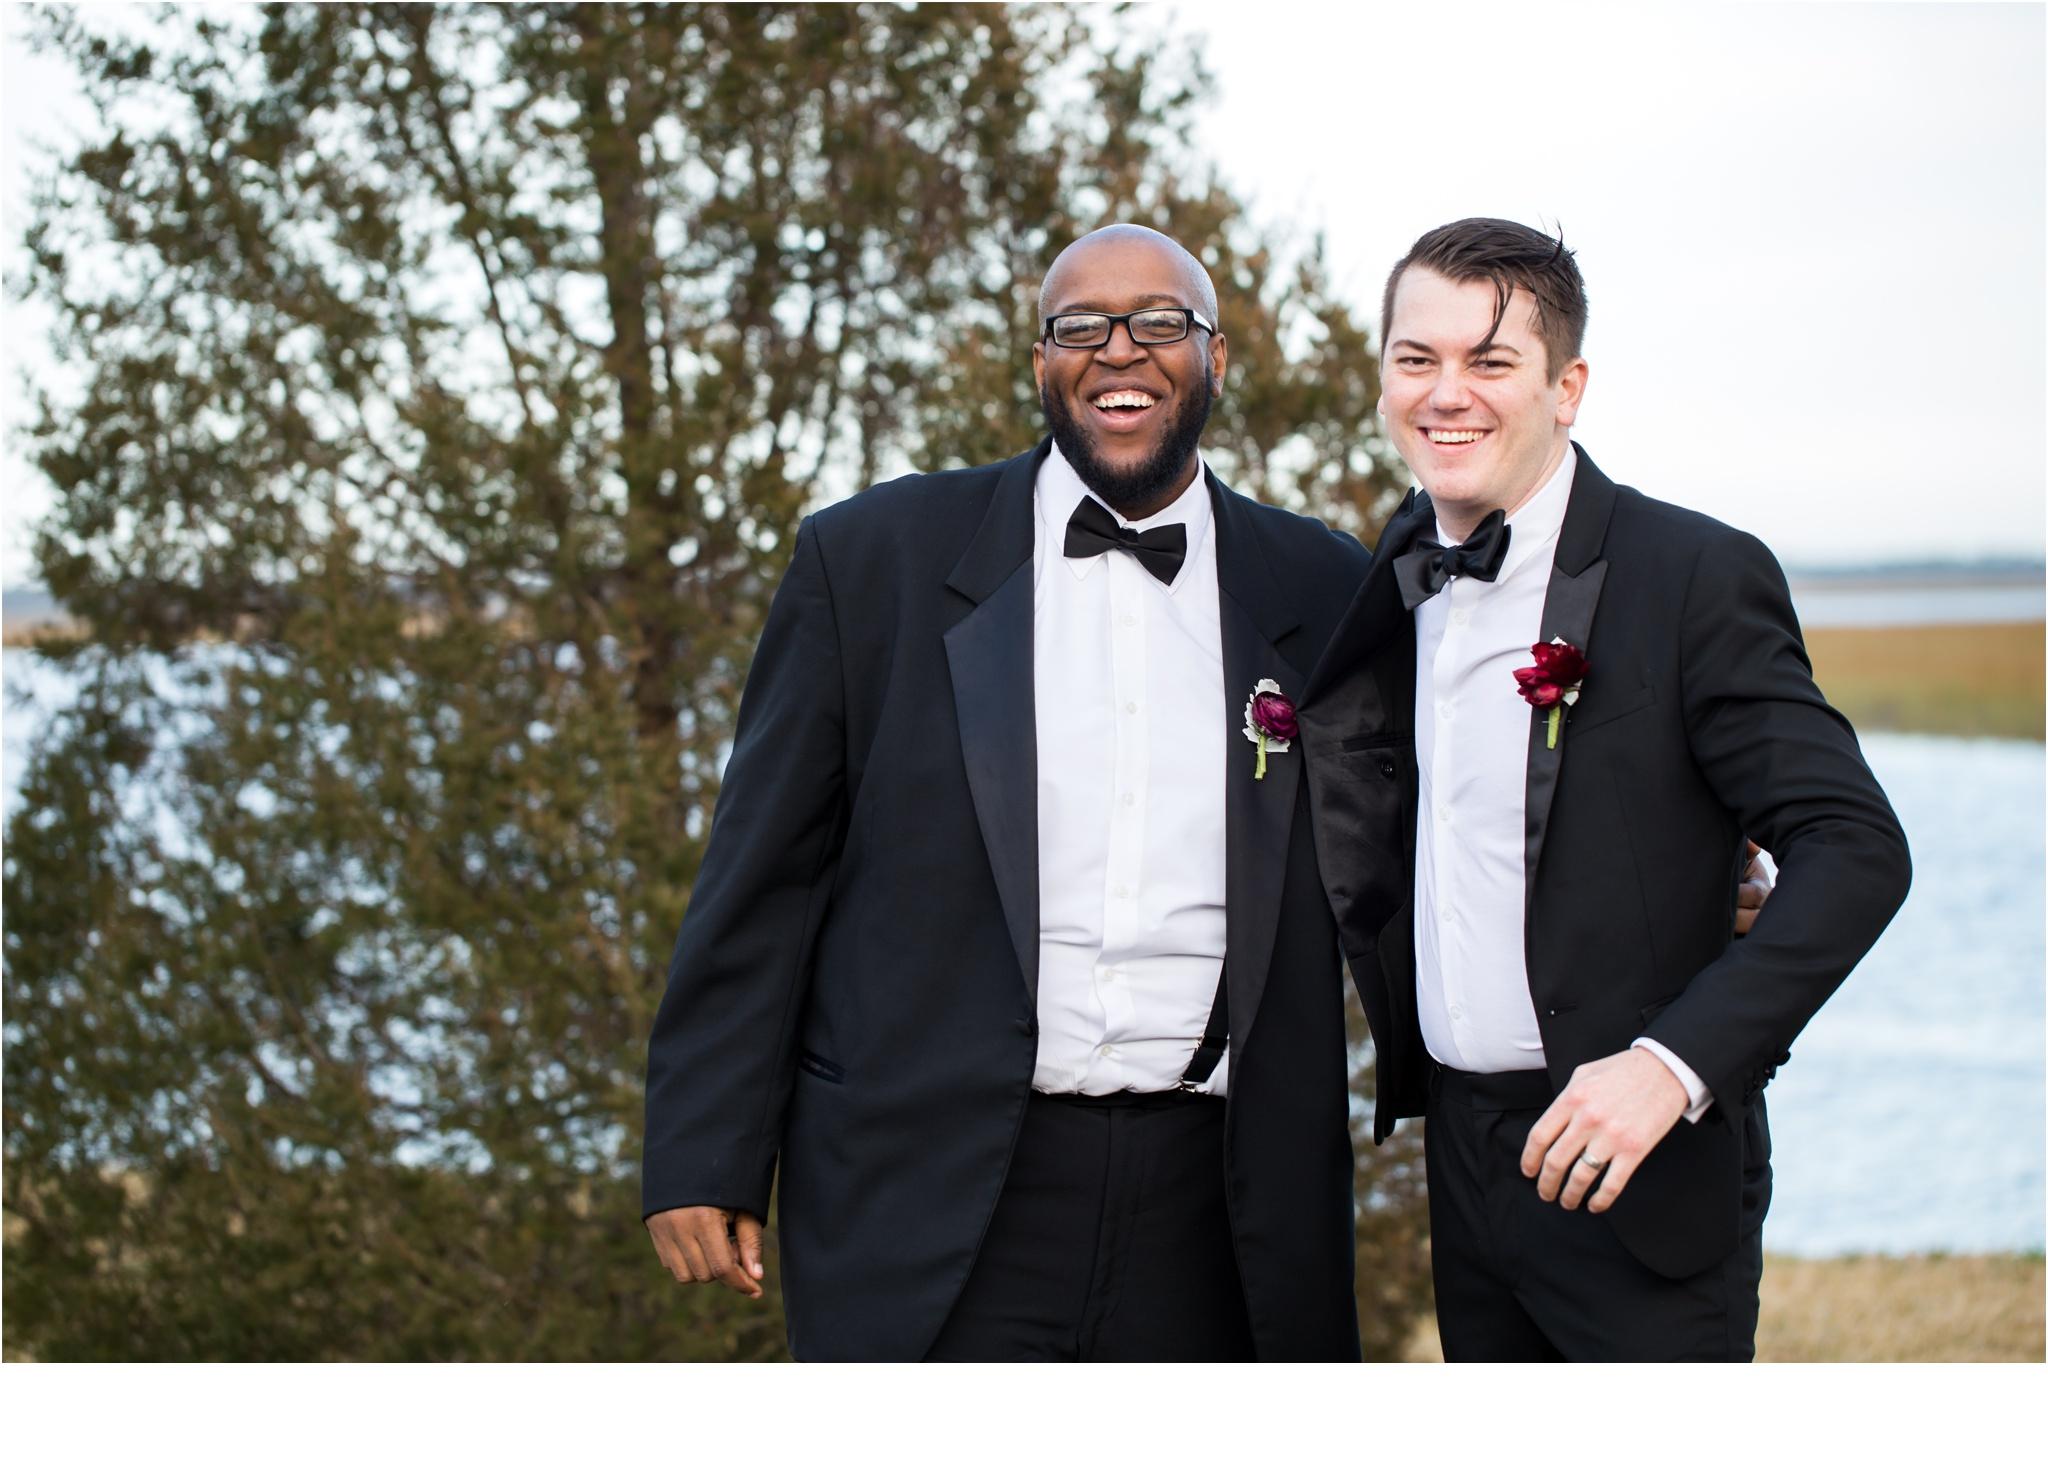 Rainey_Gregg_Photography_St._Simons_Island_Georgia_California_Wedding_Portrait_Photography_0868.jpg